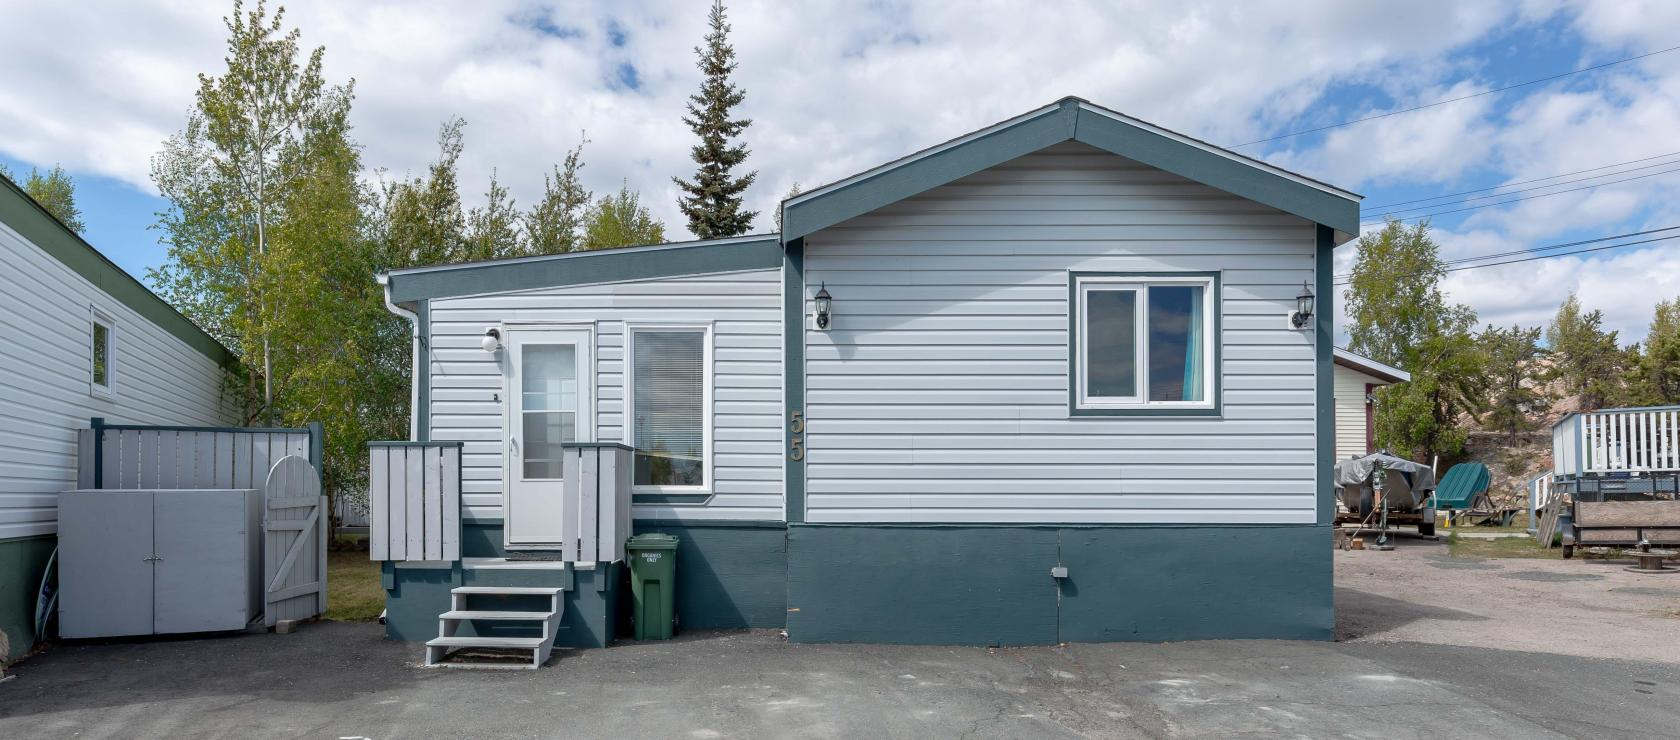 55 Hordal Road, Frame Lake, Yellowknife 2